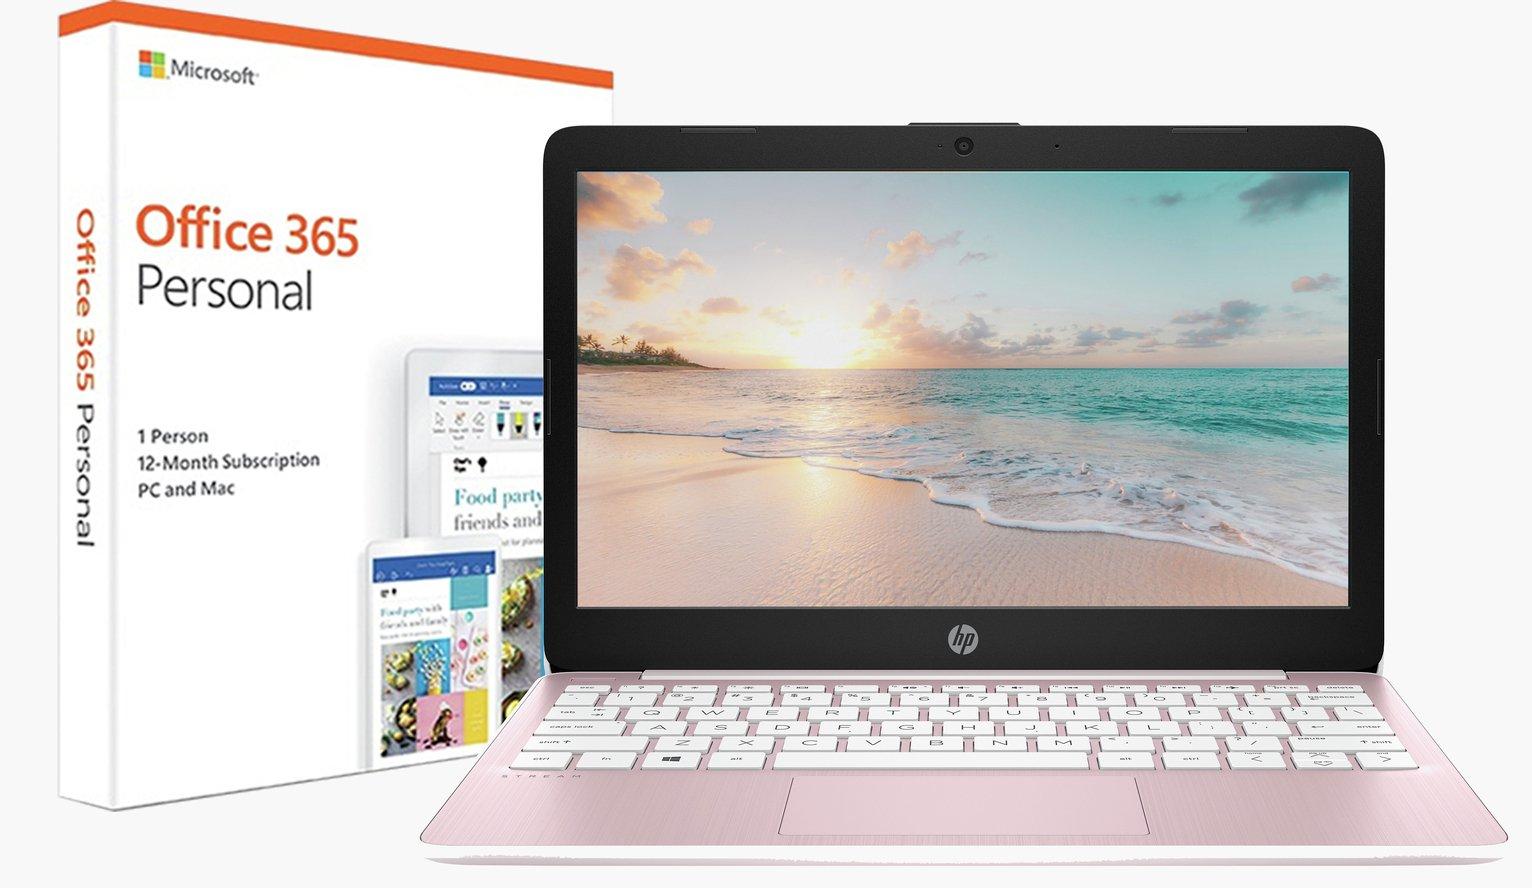 HP Stream 11.6 Inch Celeron 2GB 32GB Cloudbook - Pink